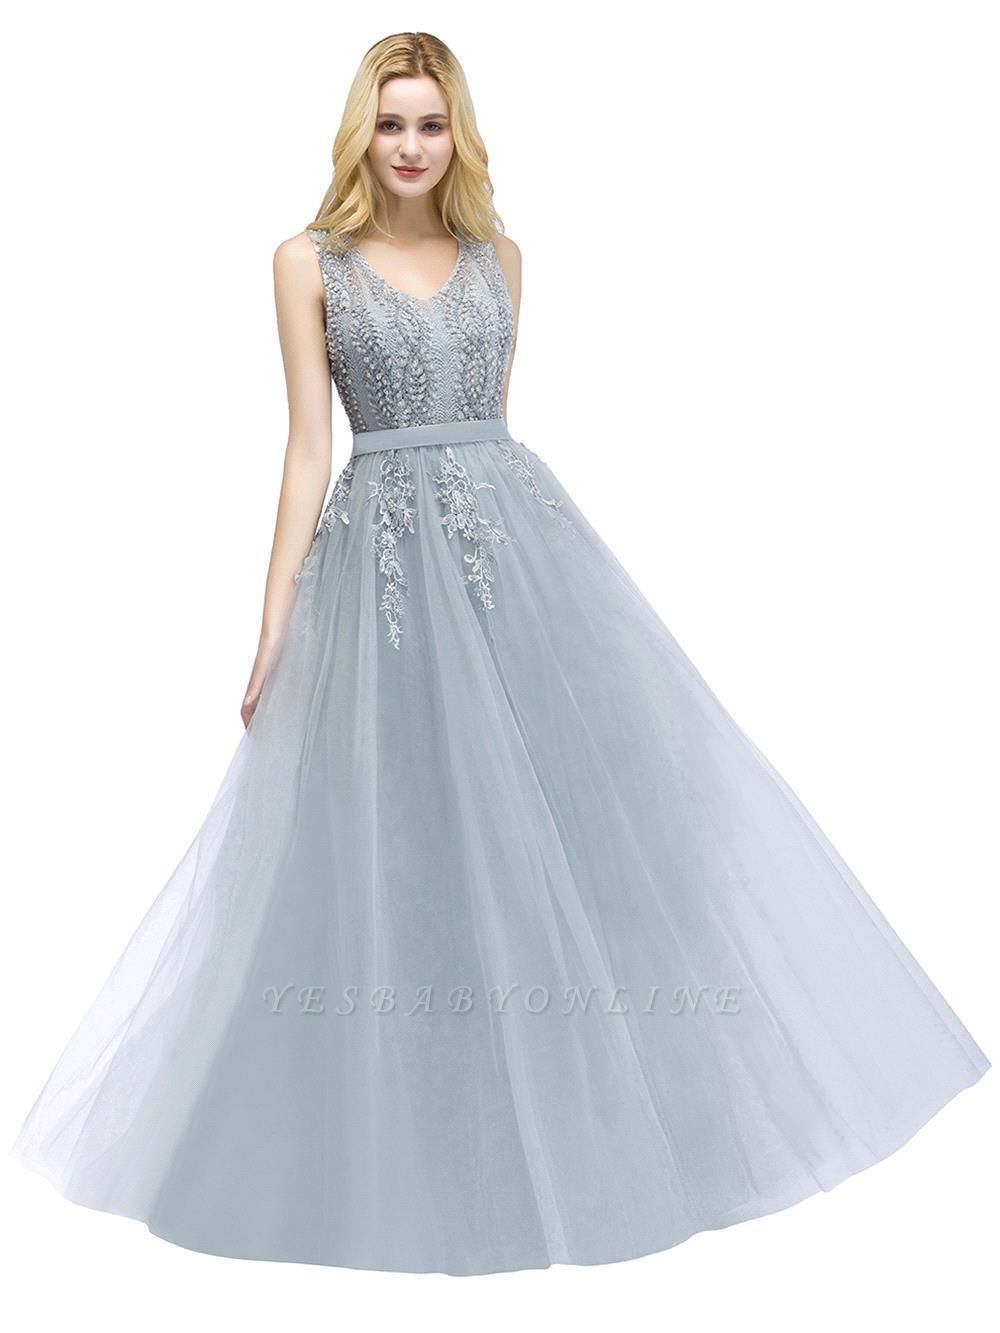 Stylish V-neck Tulle Lace Long Evening Dress On Sale